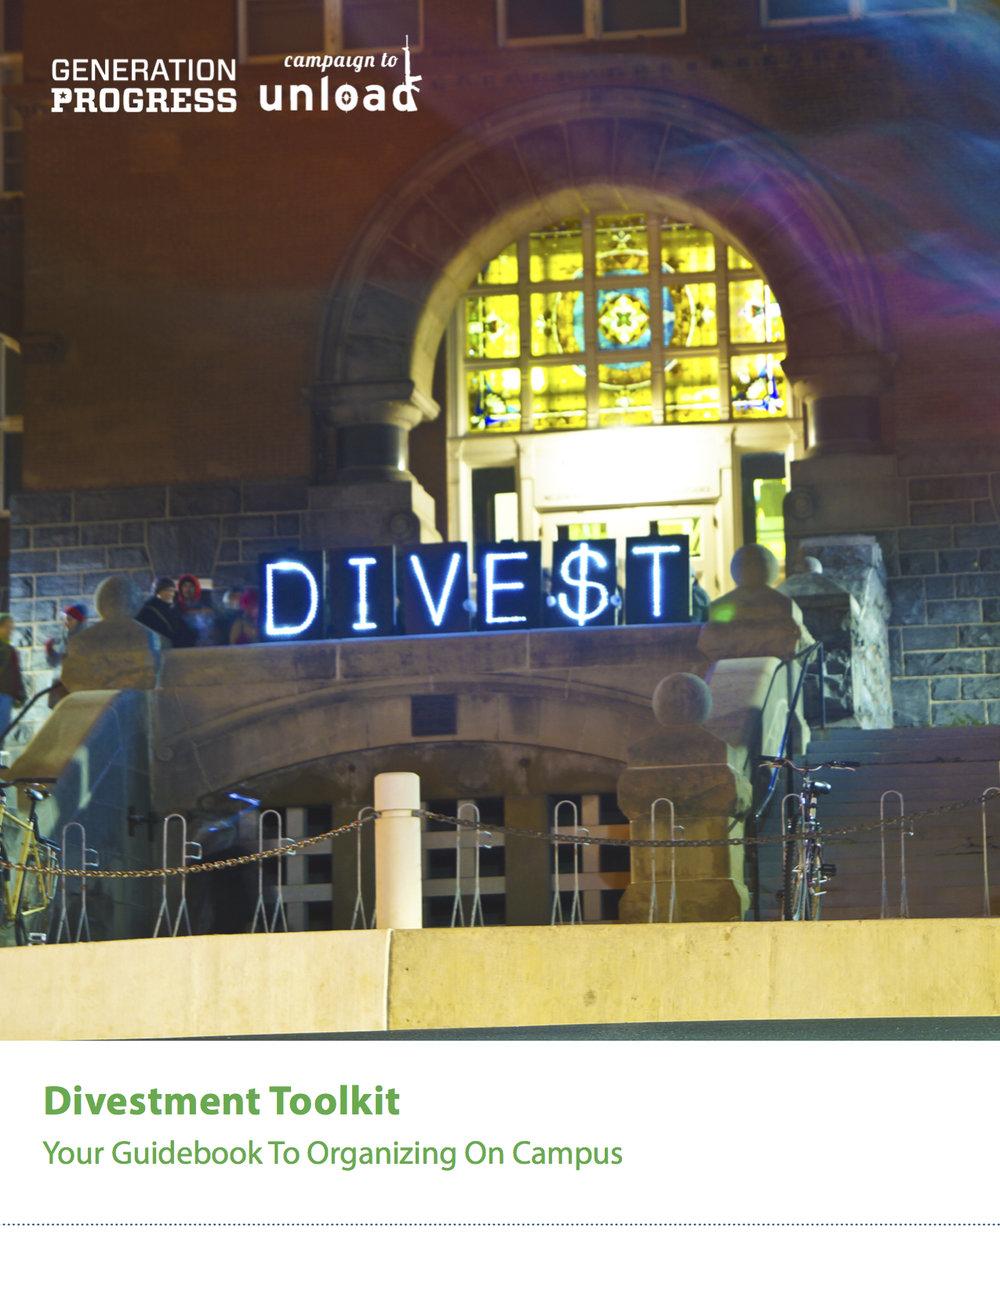 Divestment-Toolkit-1.jpg